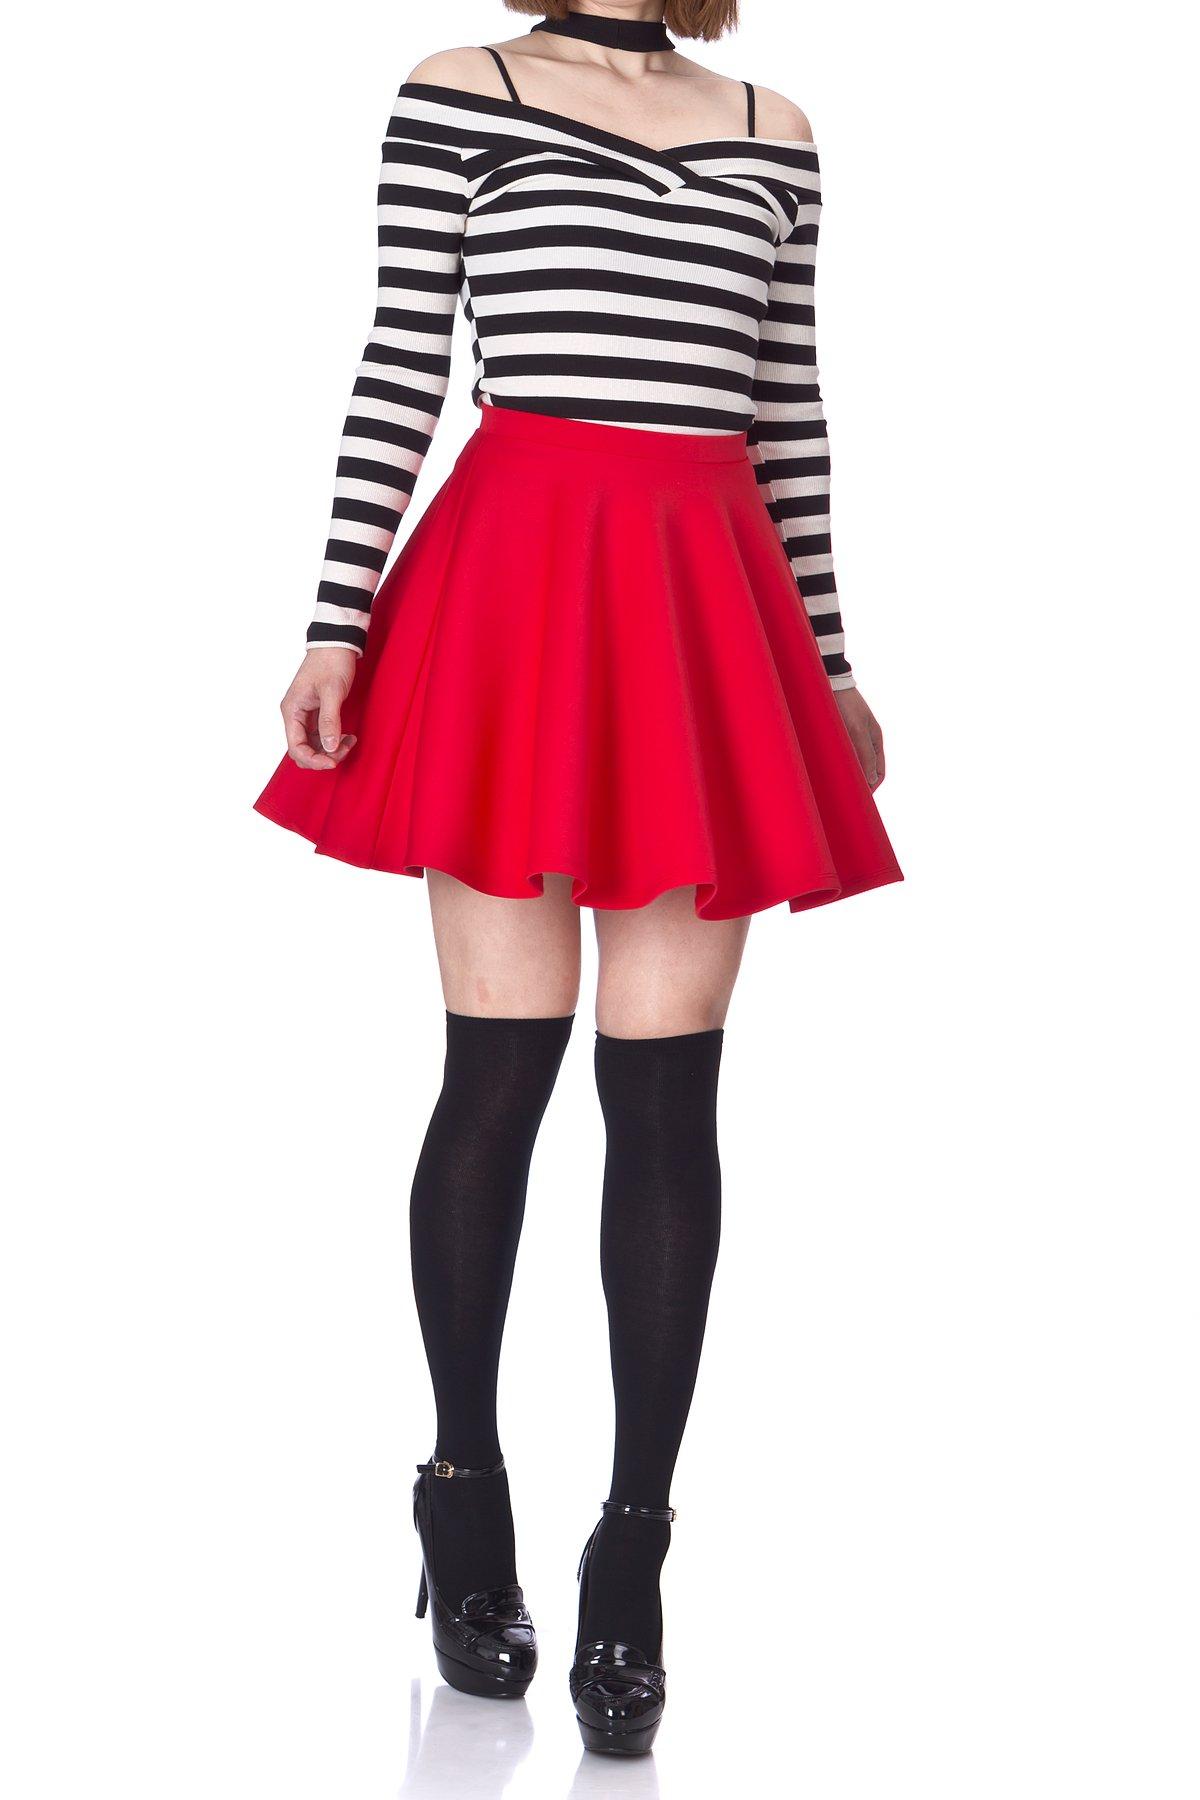 Flouncy High Waist A-line Full FlaCherry Red Circle Swing Dance Party Casual Skater Short Mini Skirt (L, Cherry Red)